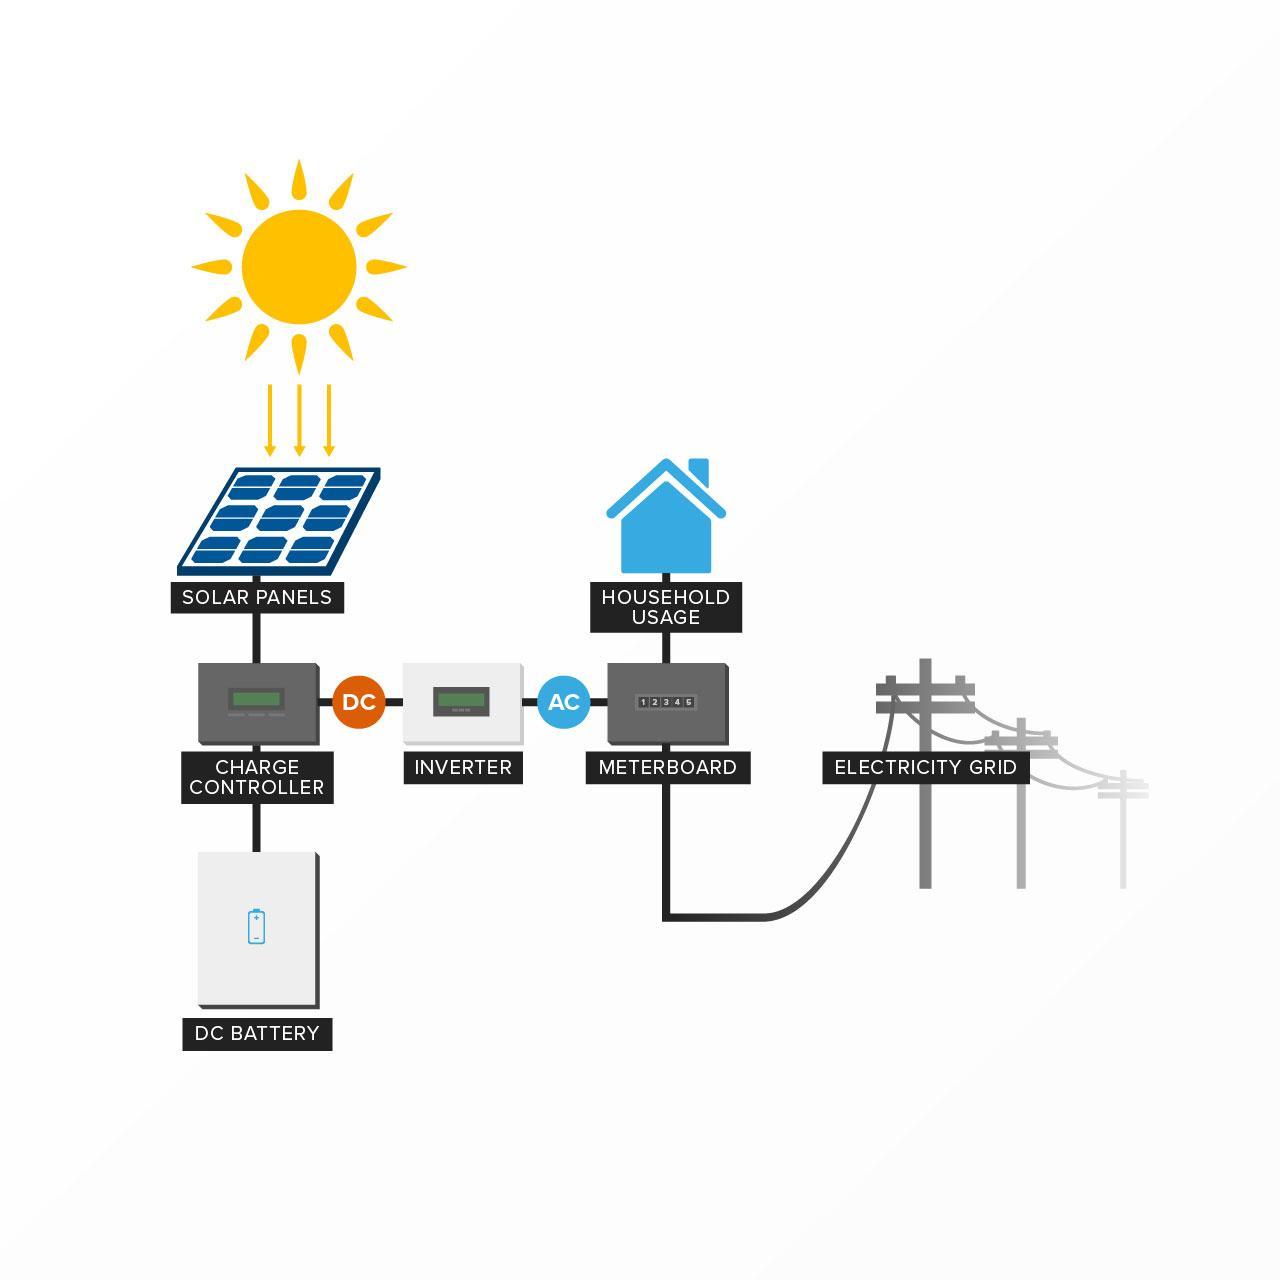 Direct Current (DC) Batteries